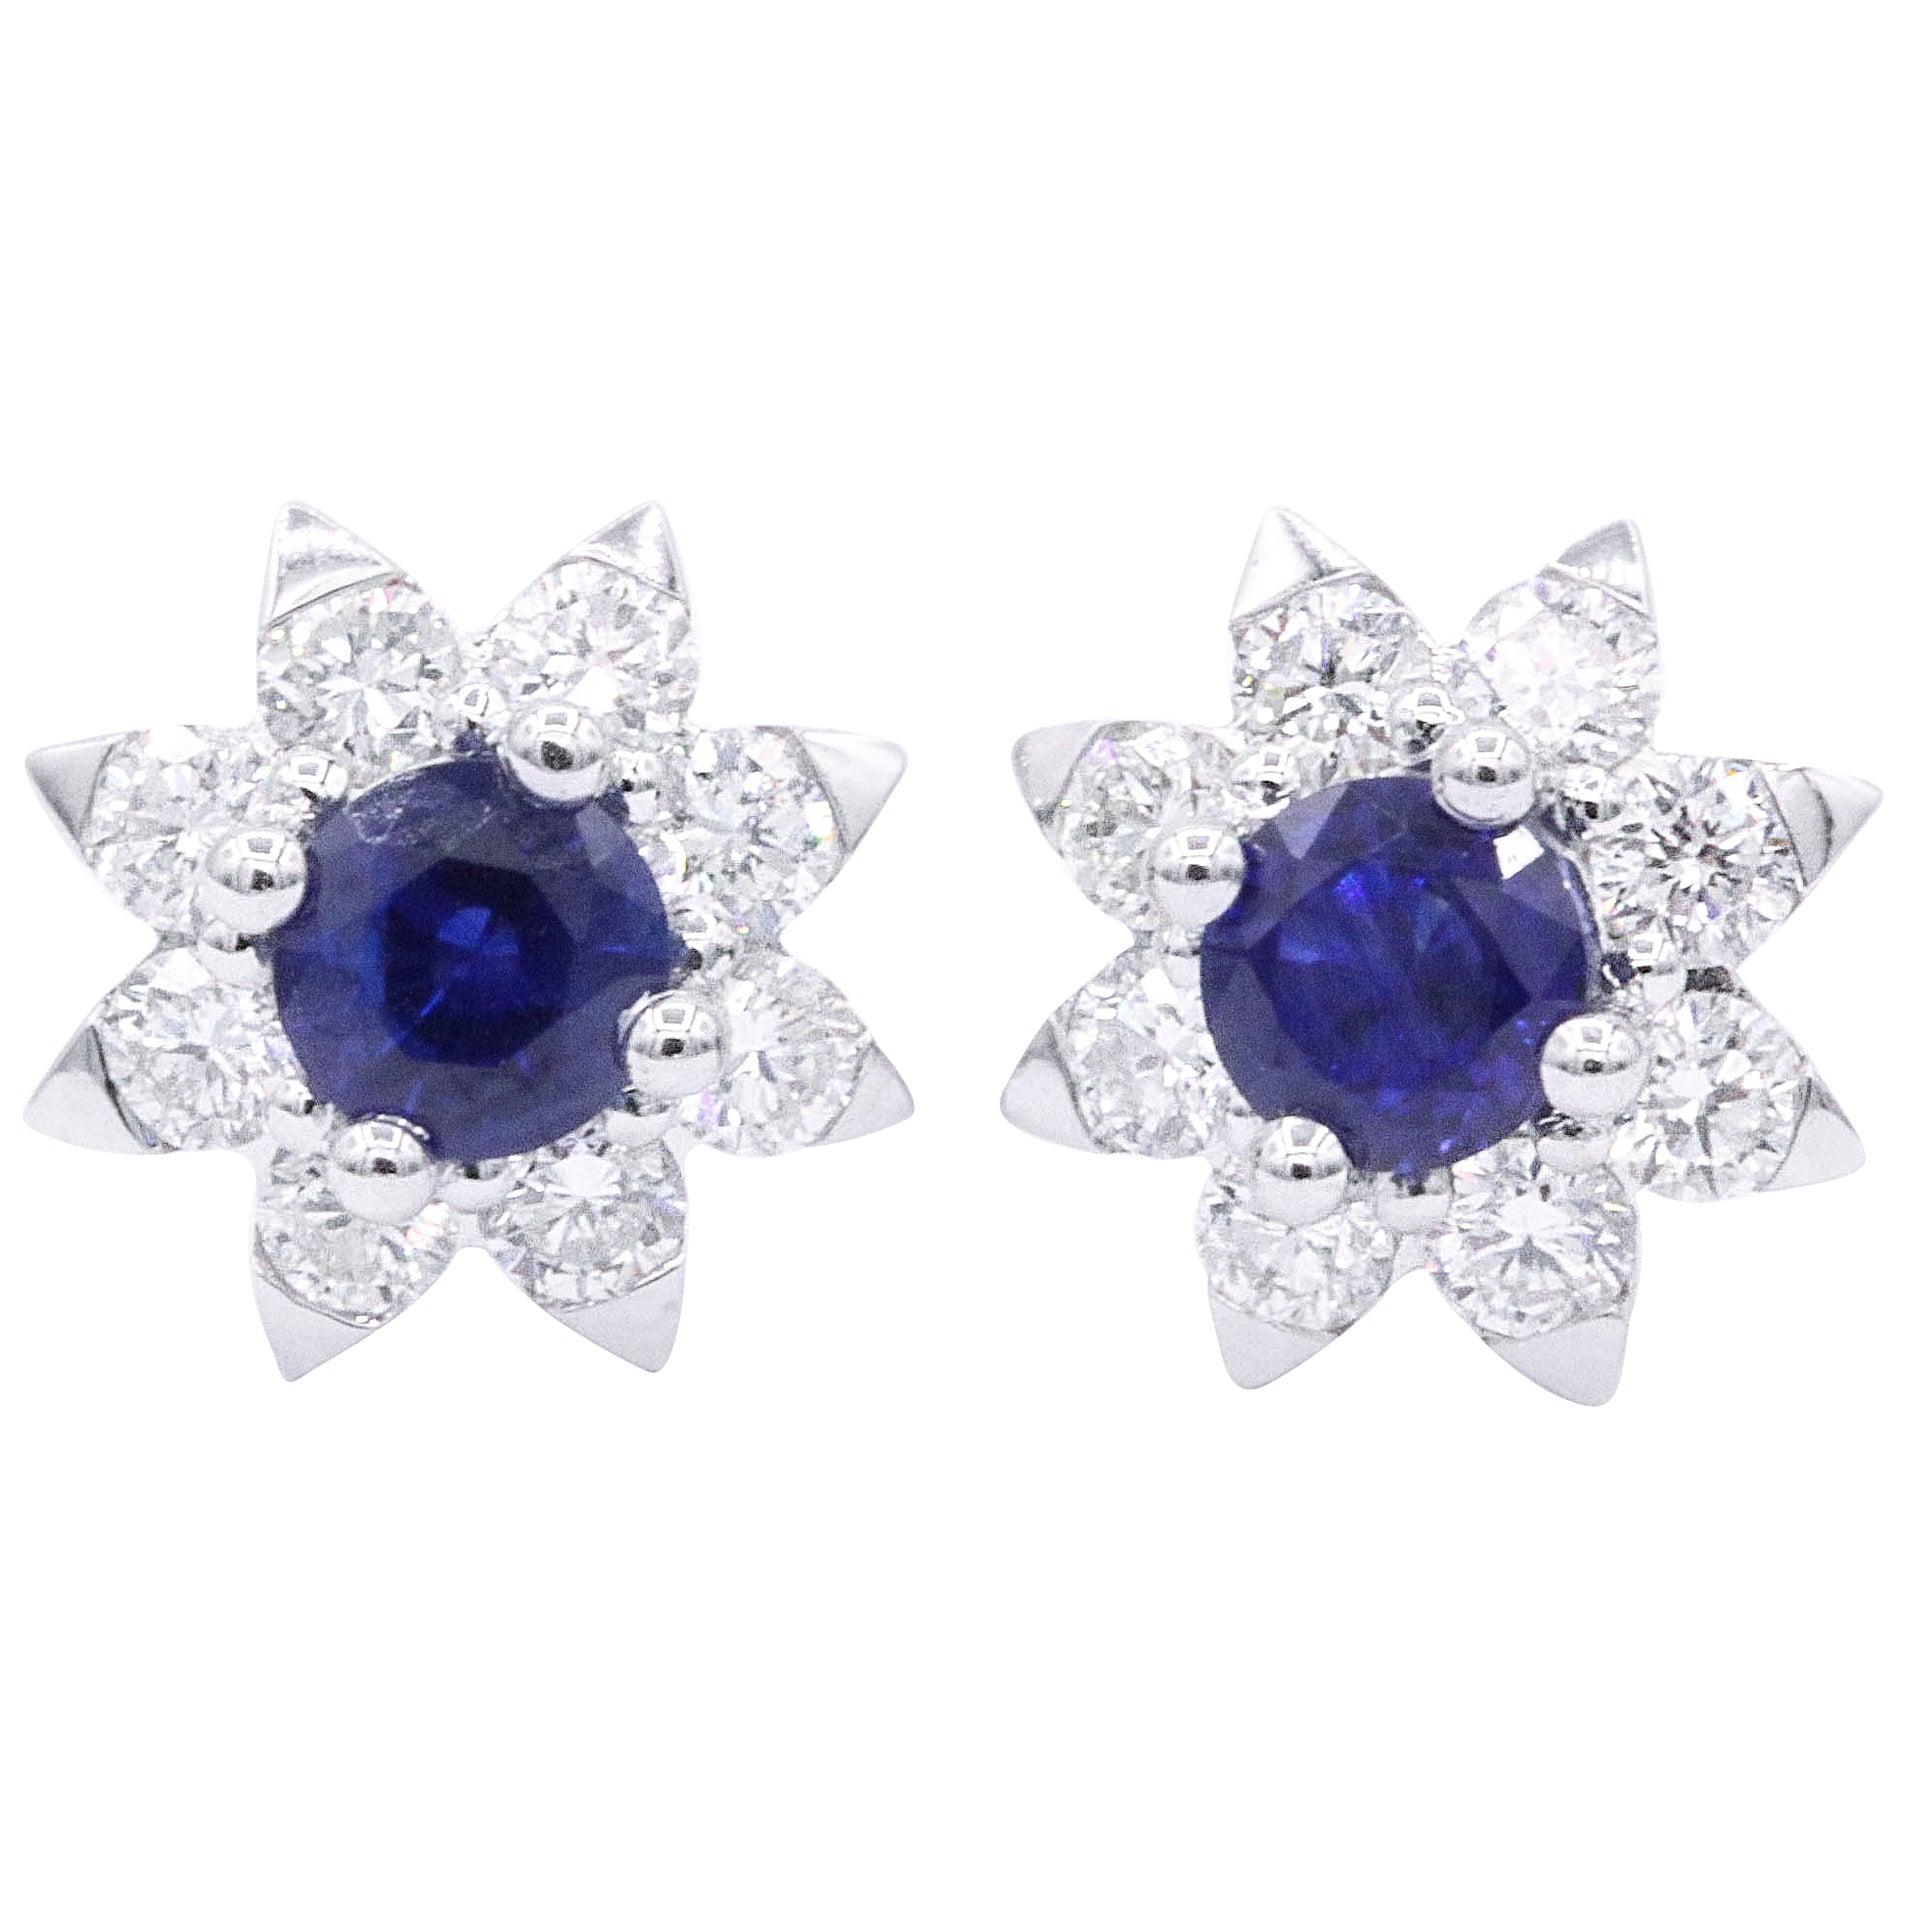 Sapphire and Diamond Halo Studs Earrings